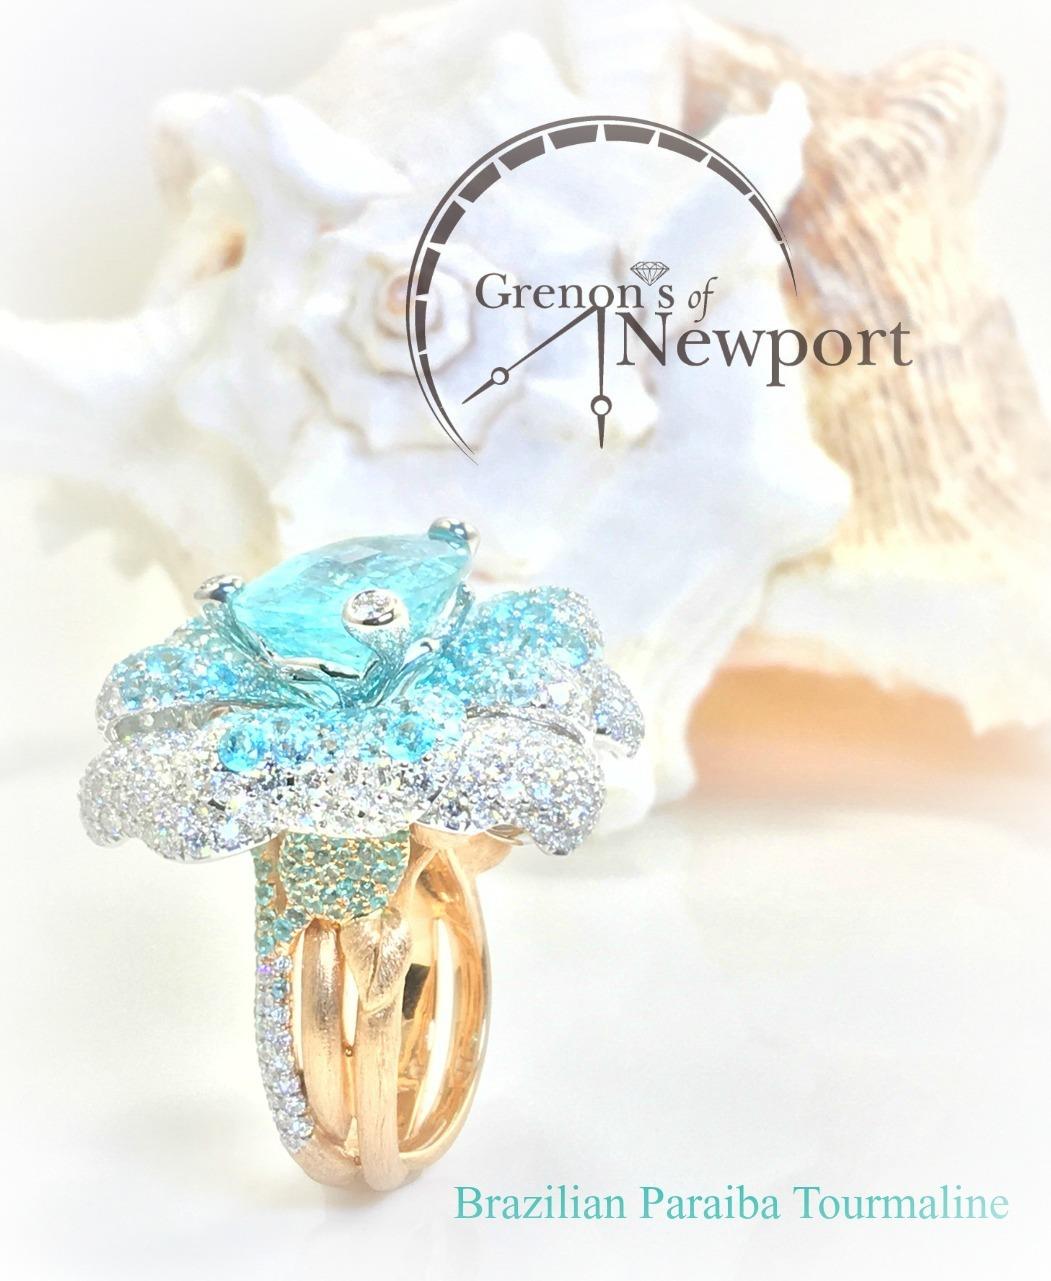 Grenons_Of_Newport_Custom_design_Brazilian_Paraiba_Tourmaline